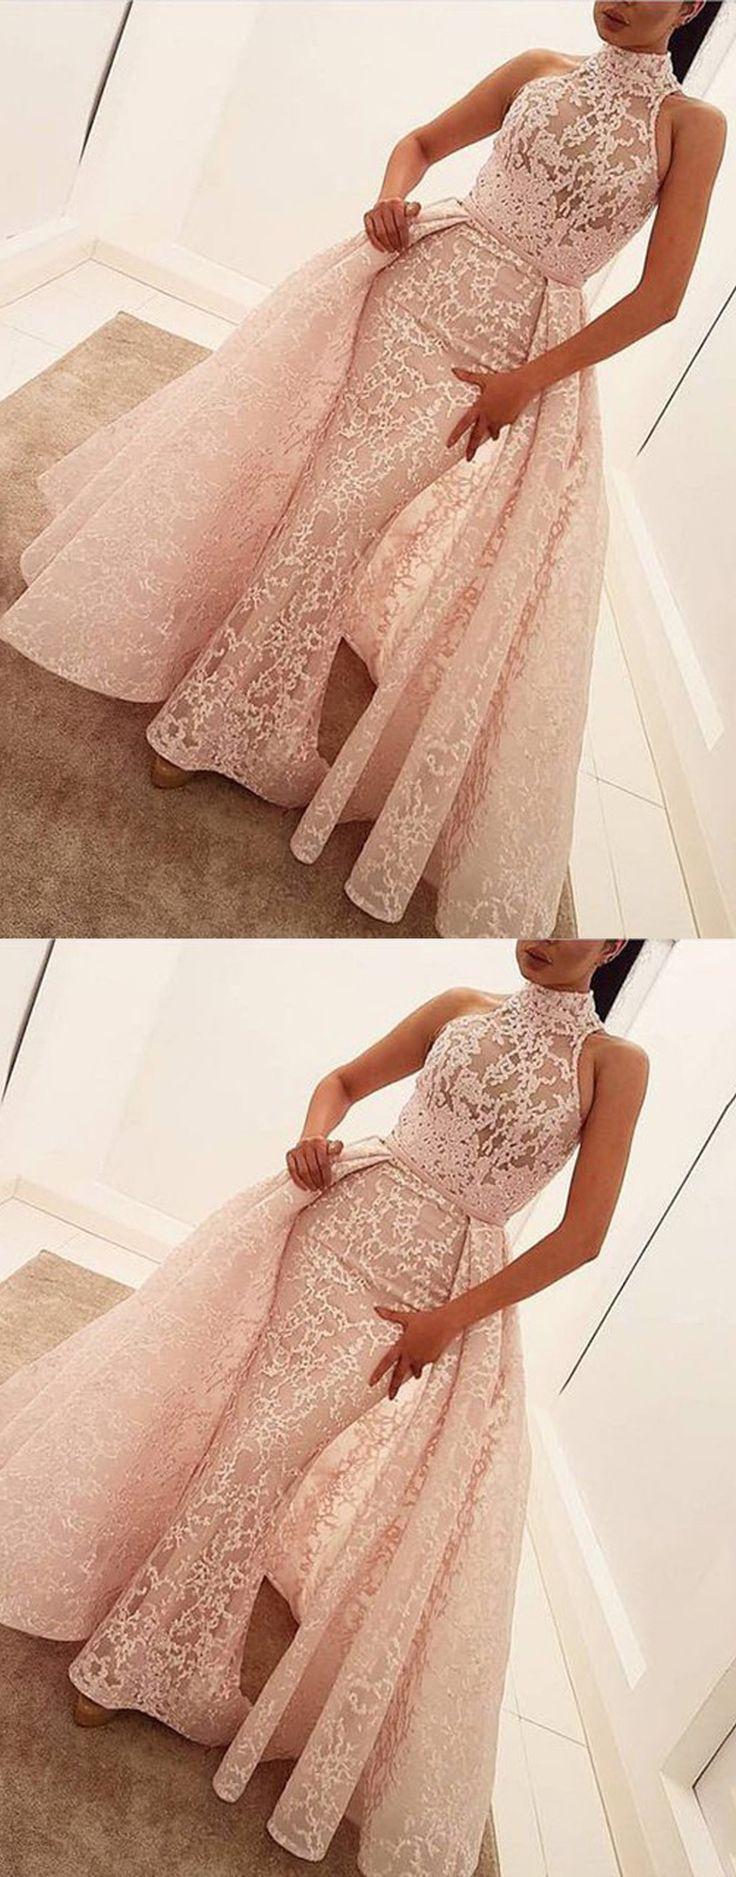 Mermaid Prom Dresses,High Neck Prom Dresses,Sweep Train Prom Dresses,Pearl Pink Prom Dresses,Lace Prom Dresses,Over skirt Prom Dresses,Prom Dresses 2017